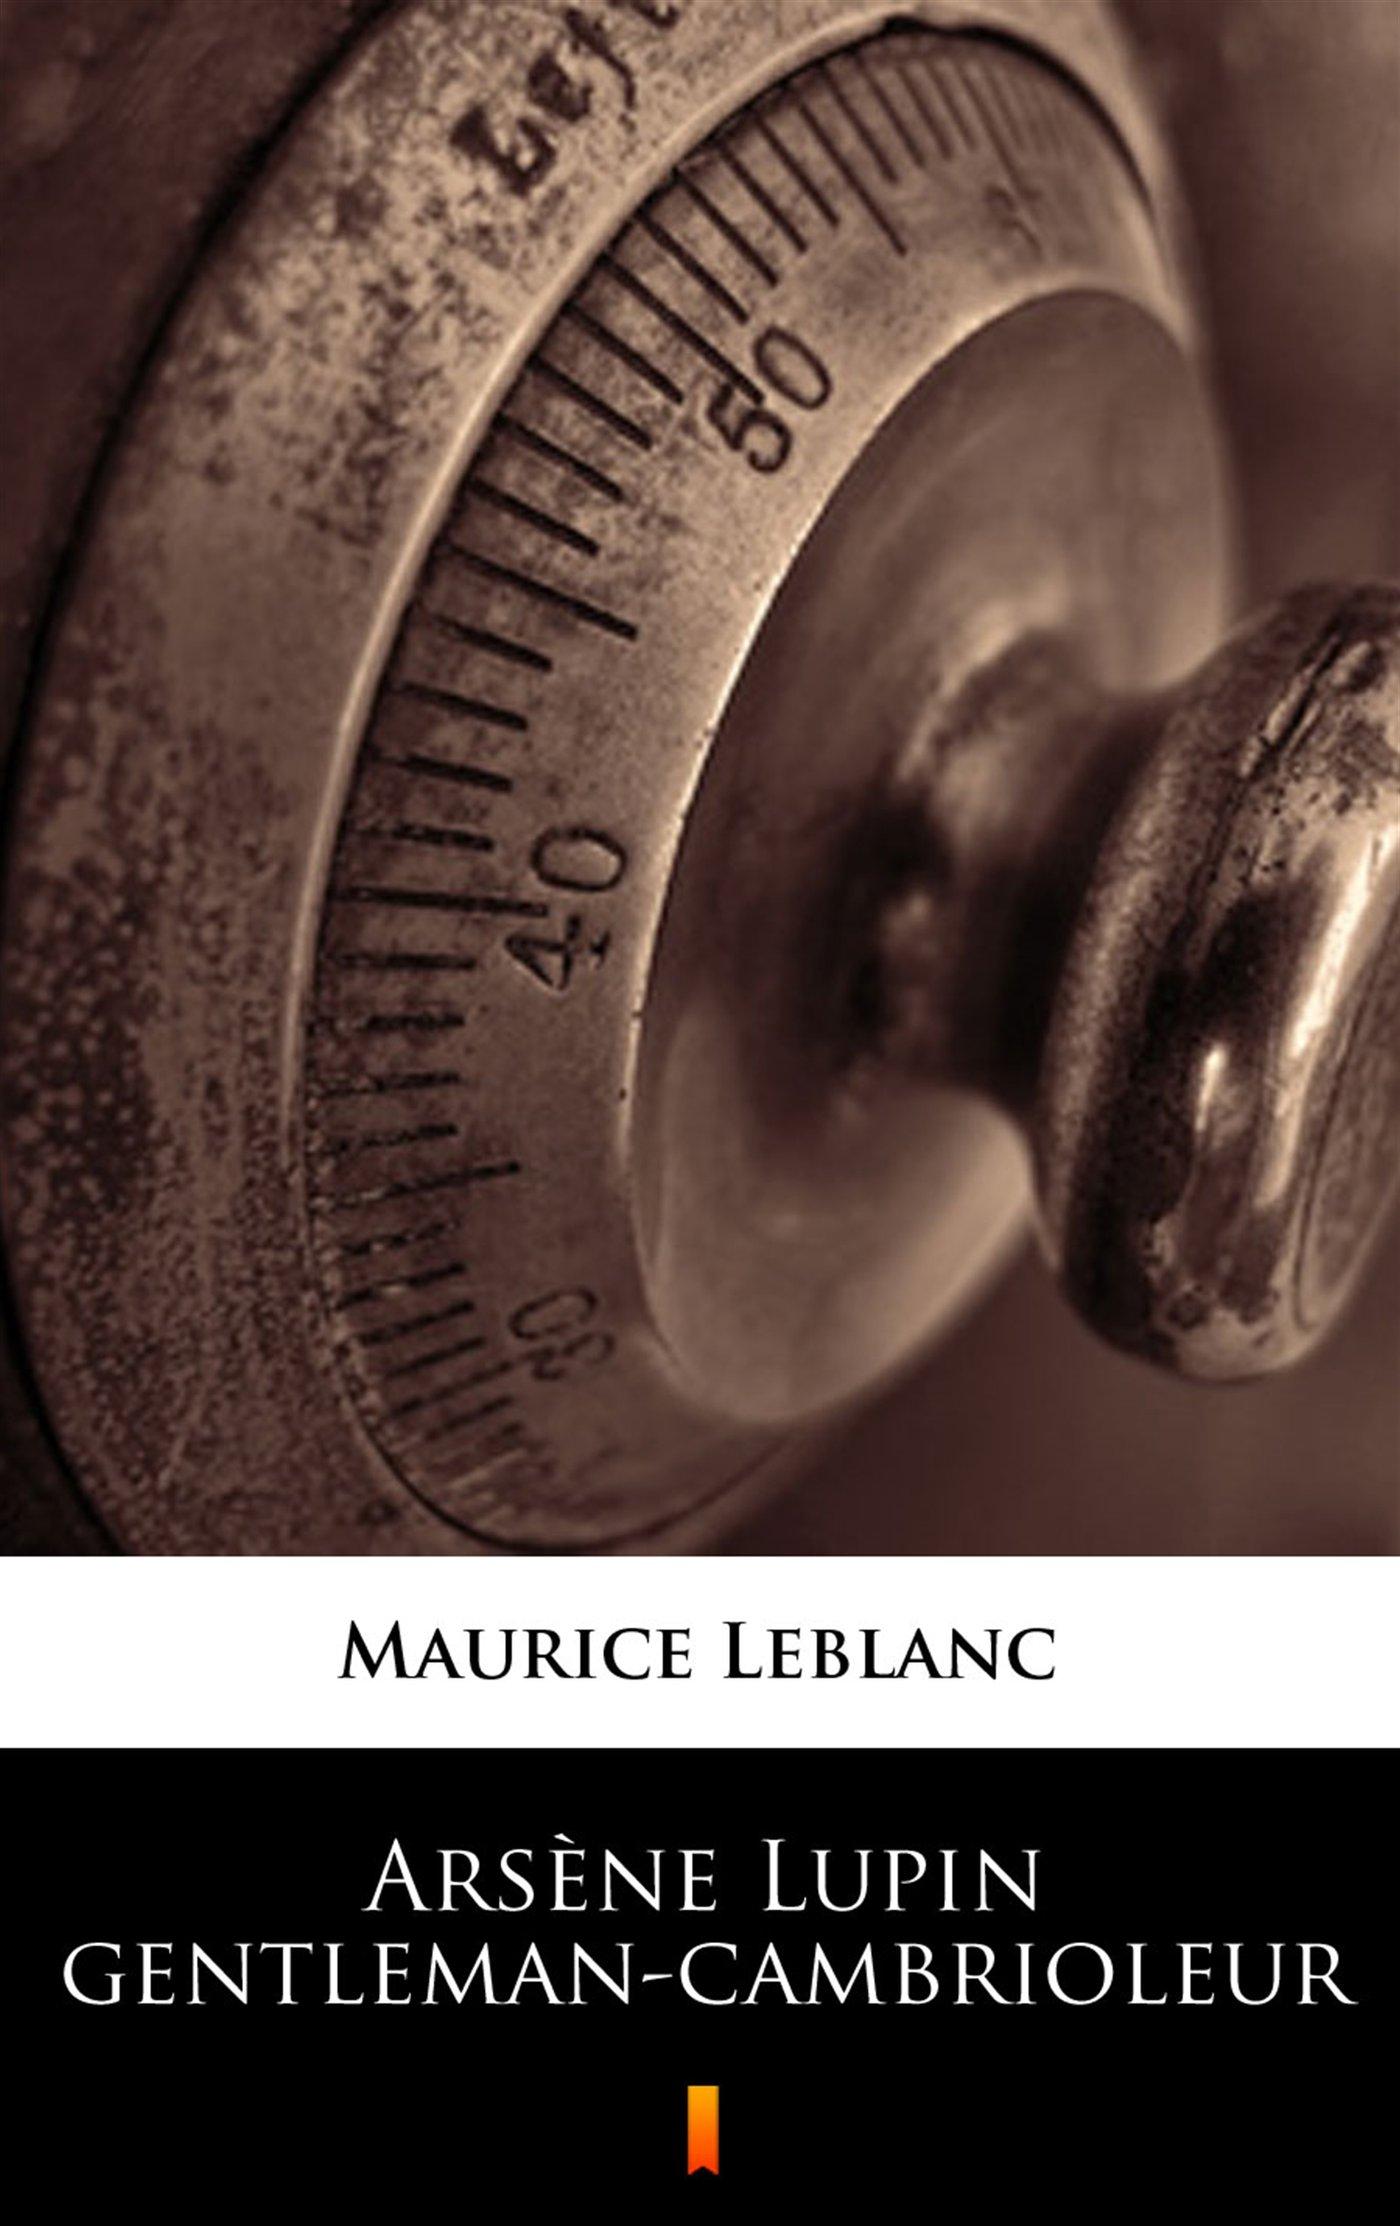 Arsene Lupin gentleman-cambrioleur - Ebook (Książka EPUB) do pobrania w formacie EPUB